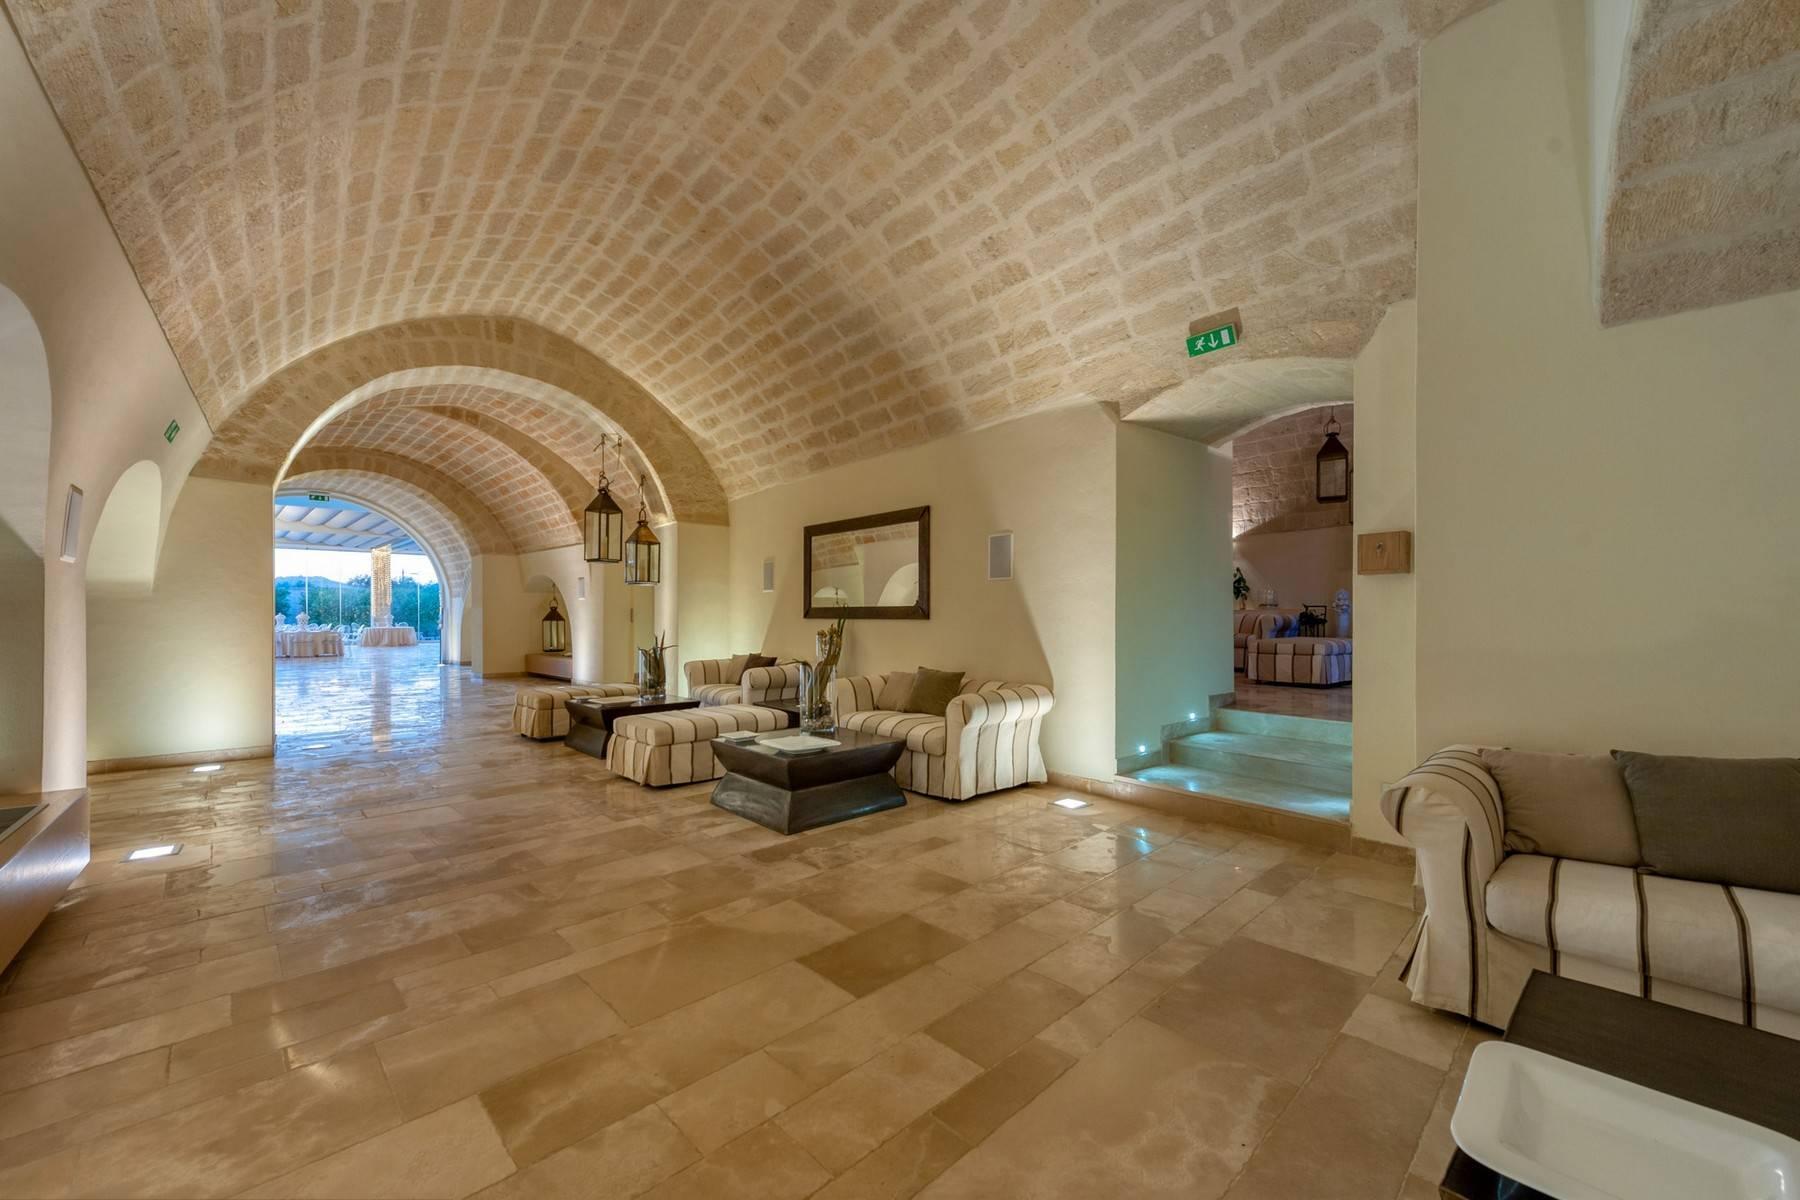 Splendida villa gentilizia del '600 circondata da agrumeti - 43